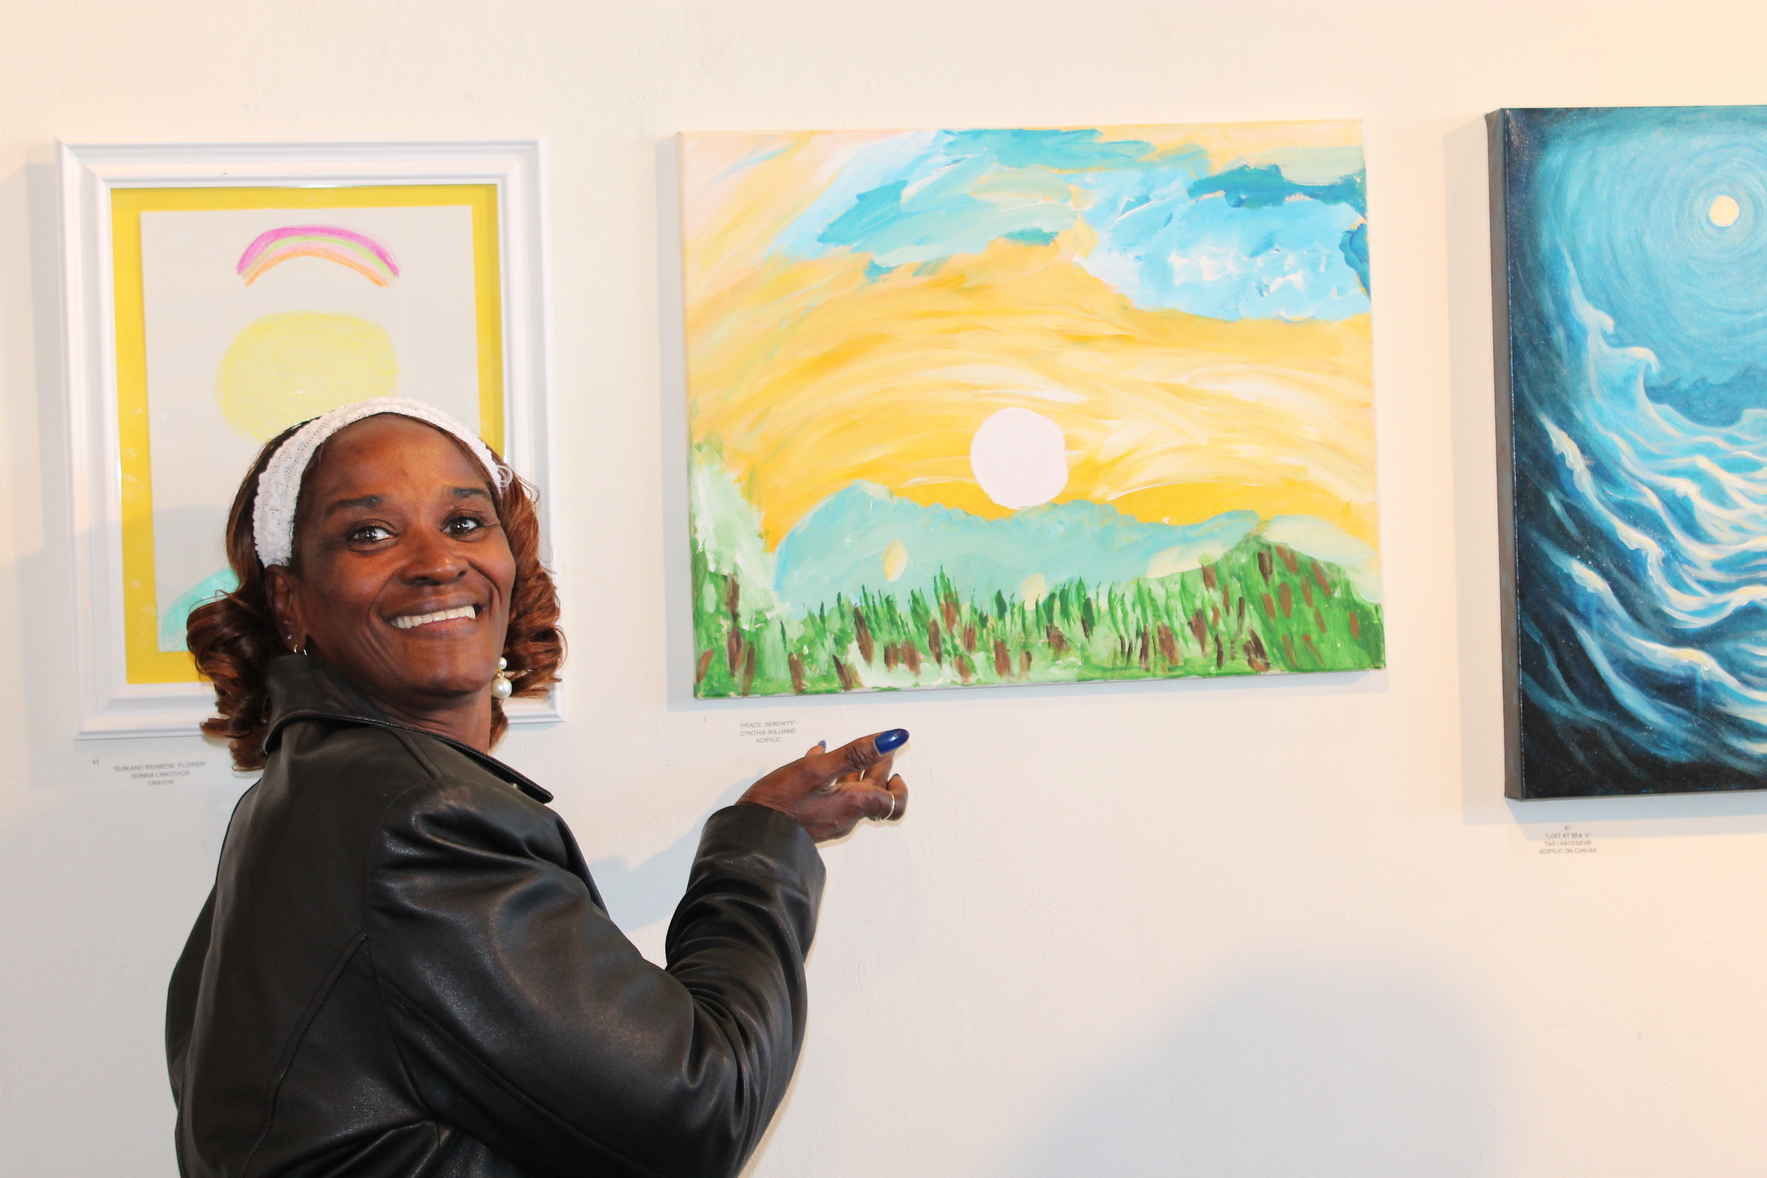 Support Mental Health Connecticut's Mending Art program image